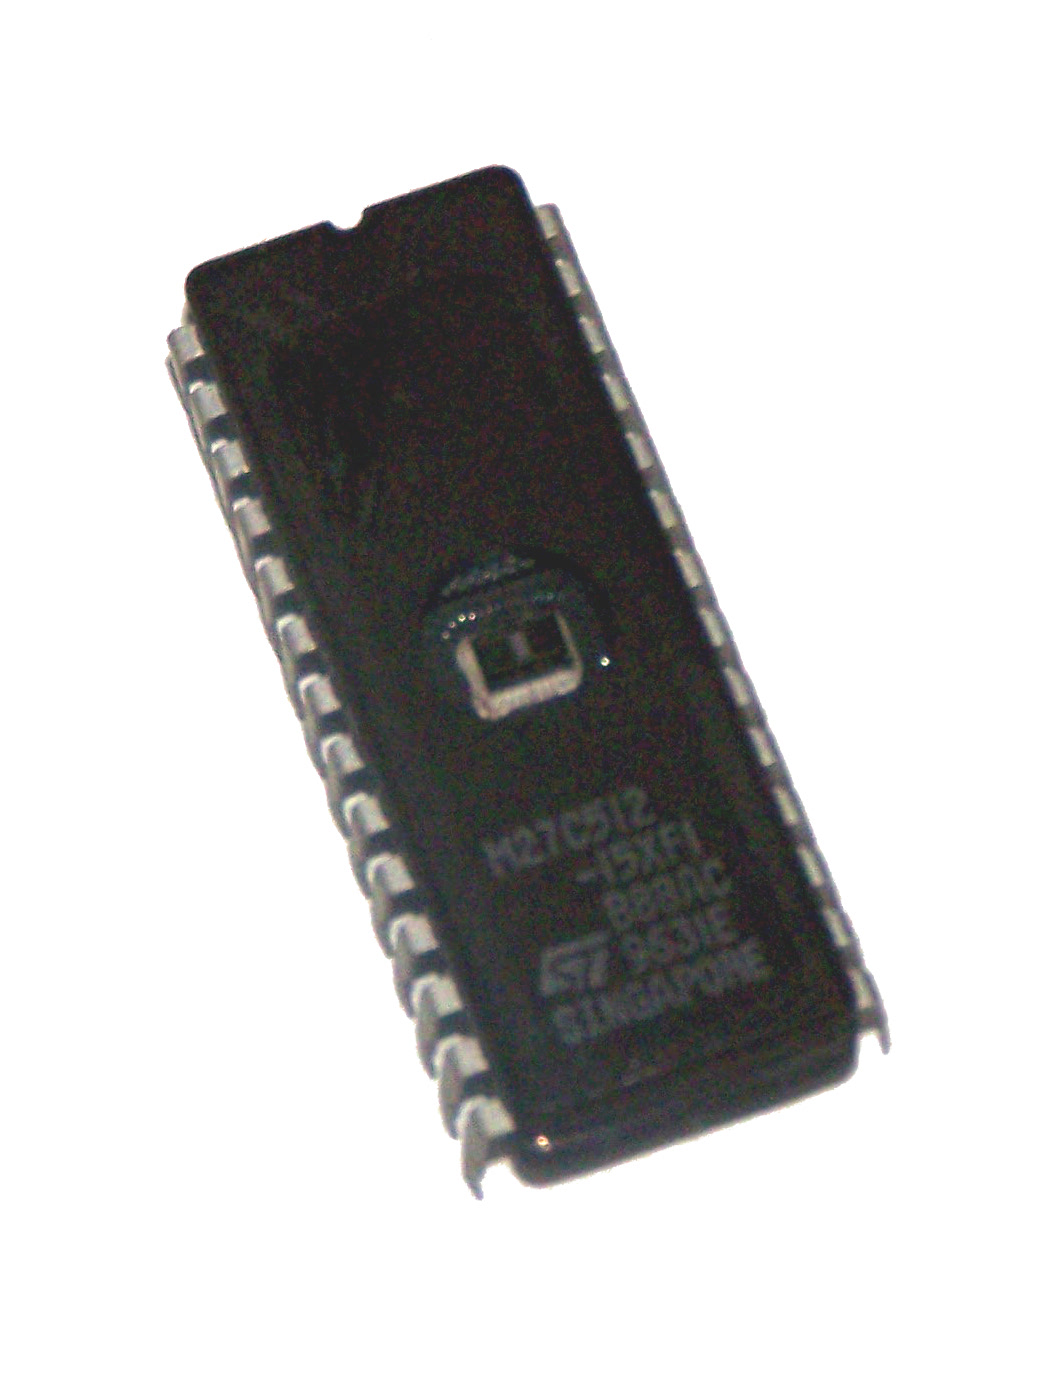 M27C512-15B1 INTEGRATED CIRCUIT  OTP 512KBIT 150NS 28DIP